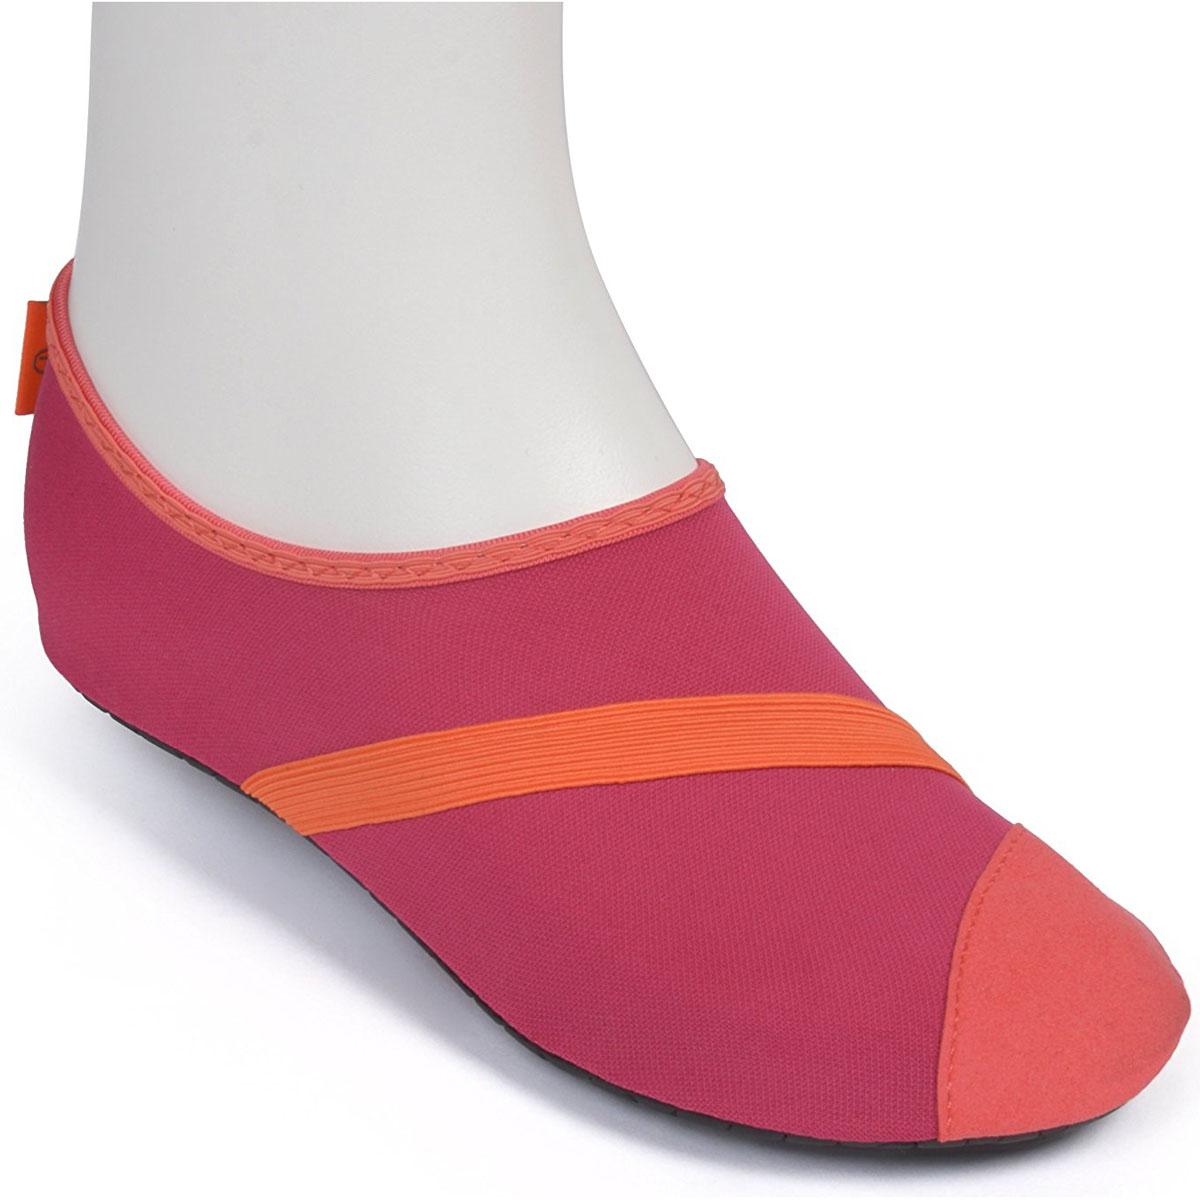 FitKicks-Women-039-s-Non-Slip-Sole-Active-Footwear thumbnail 16